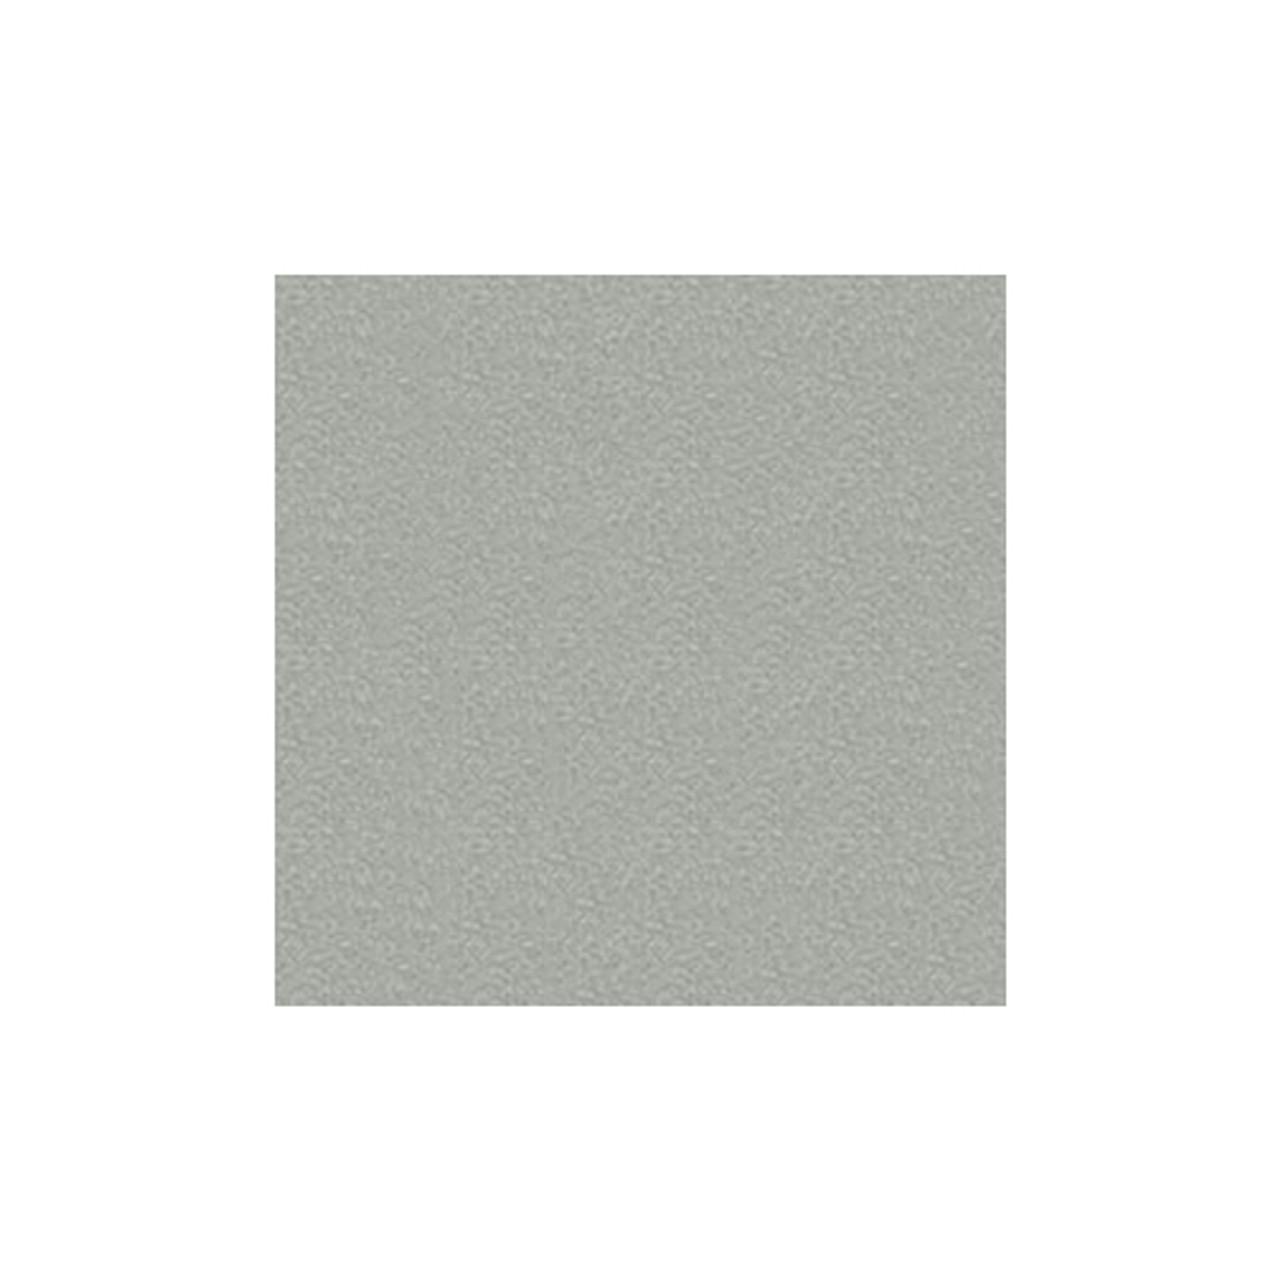 Peter Pepper Colors - Standard & Quick Ship